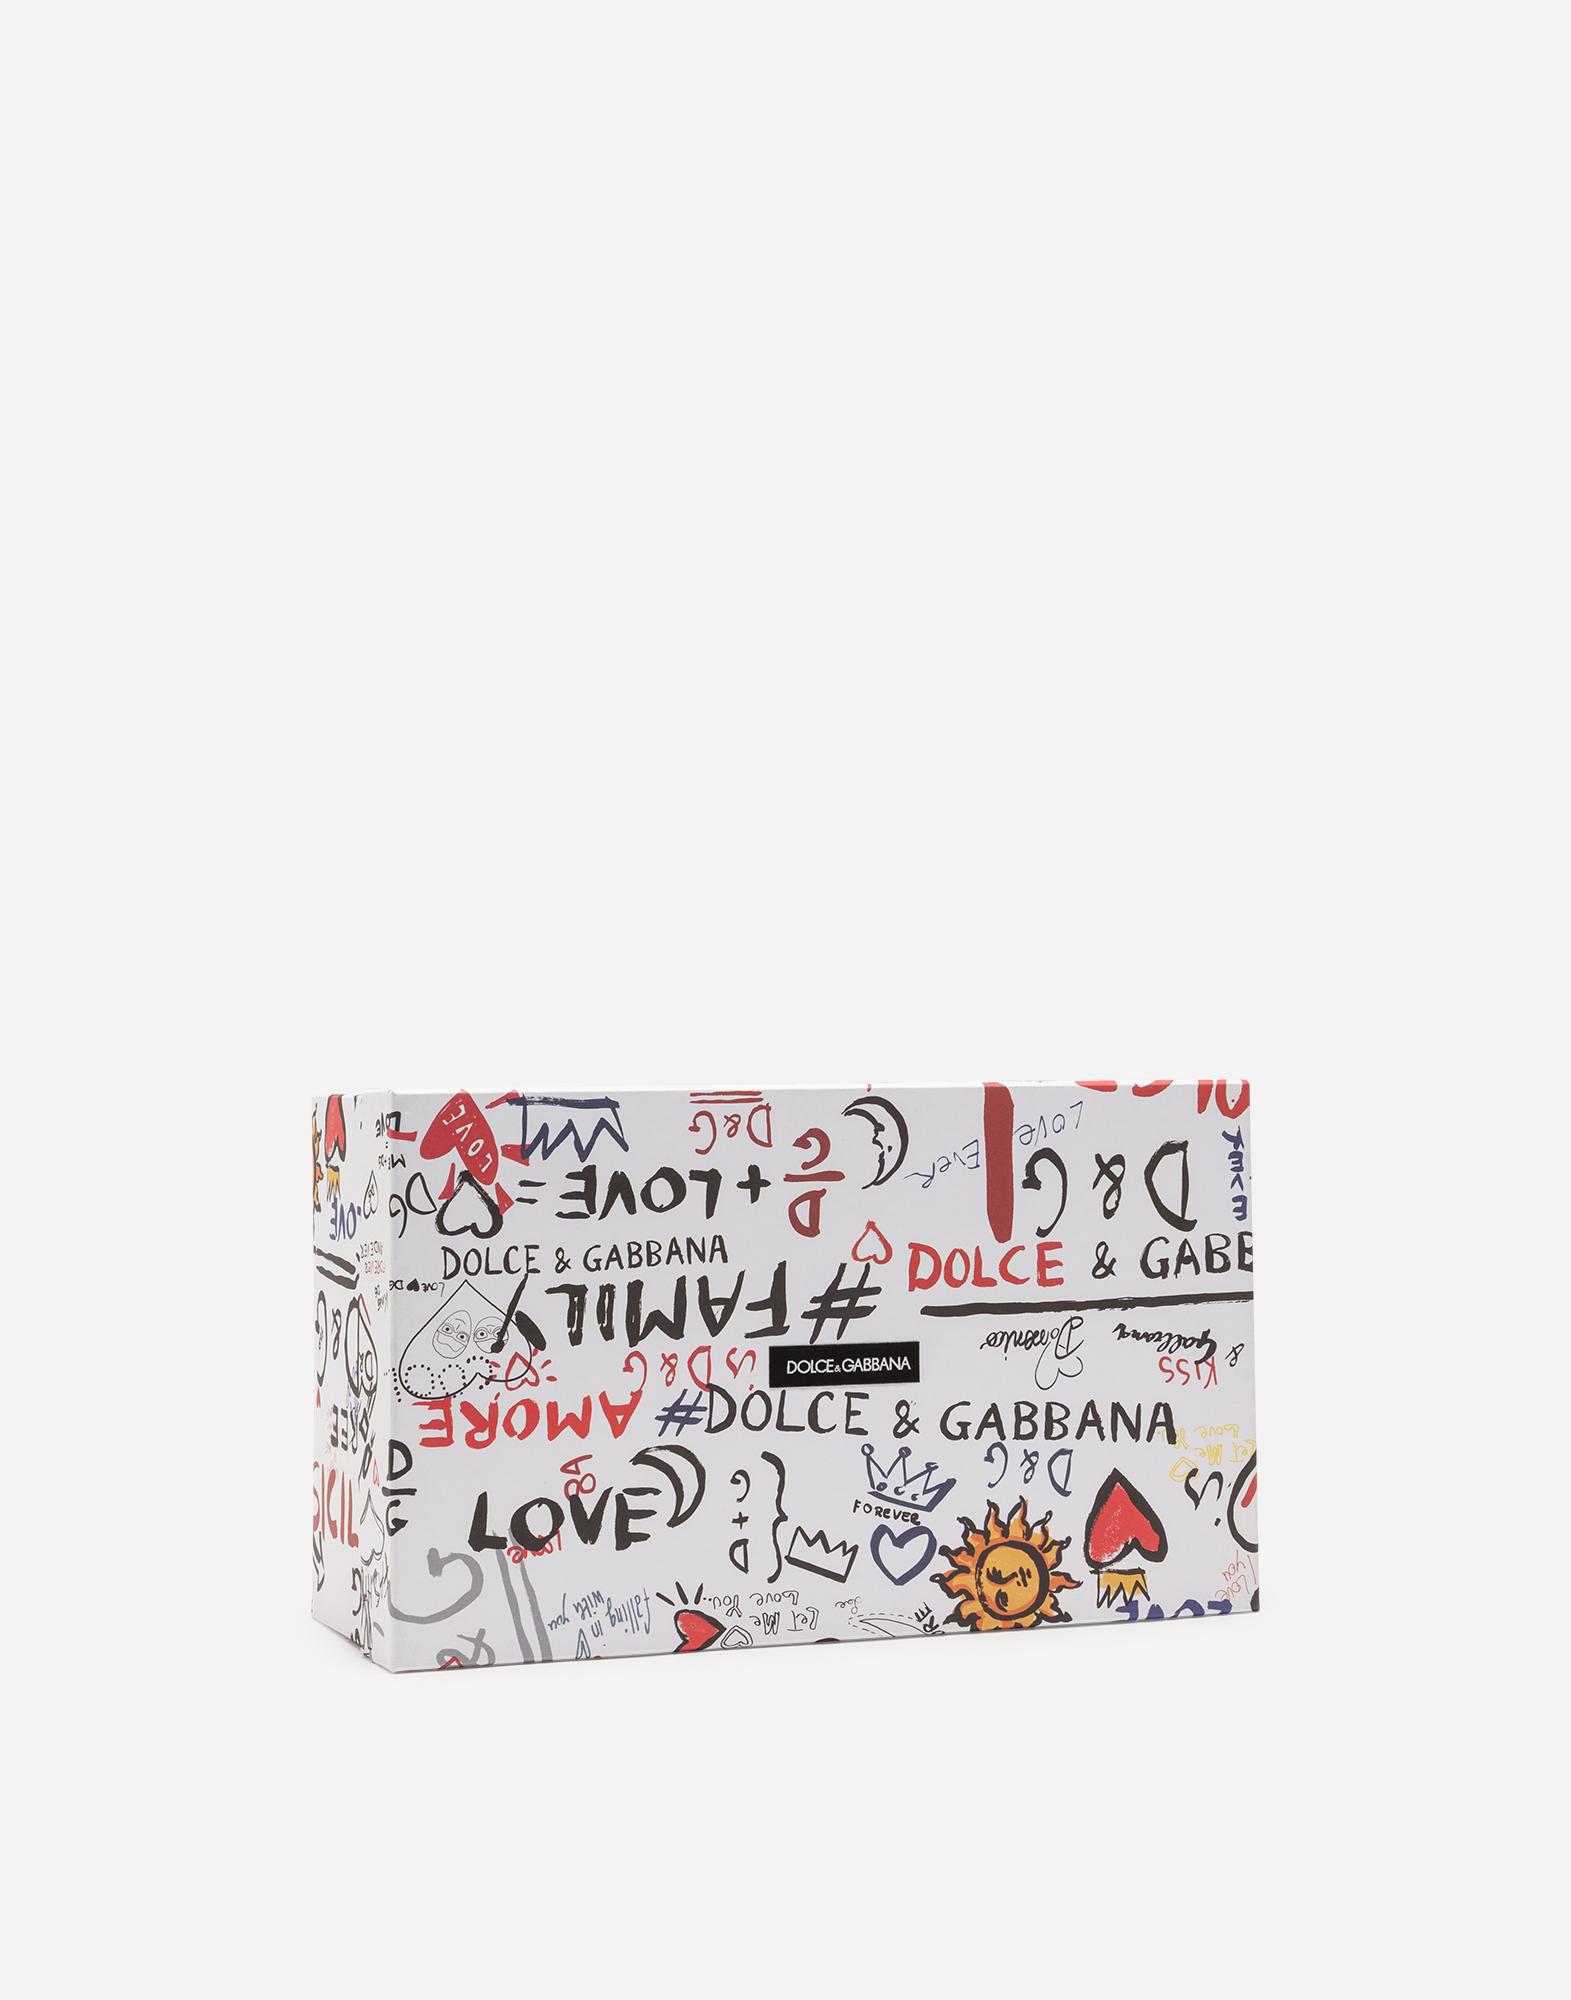 Dolce & Gabbana PORTOFINO MELT SNEAKERS IN PRINTED NAPPA LEATHER